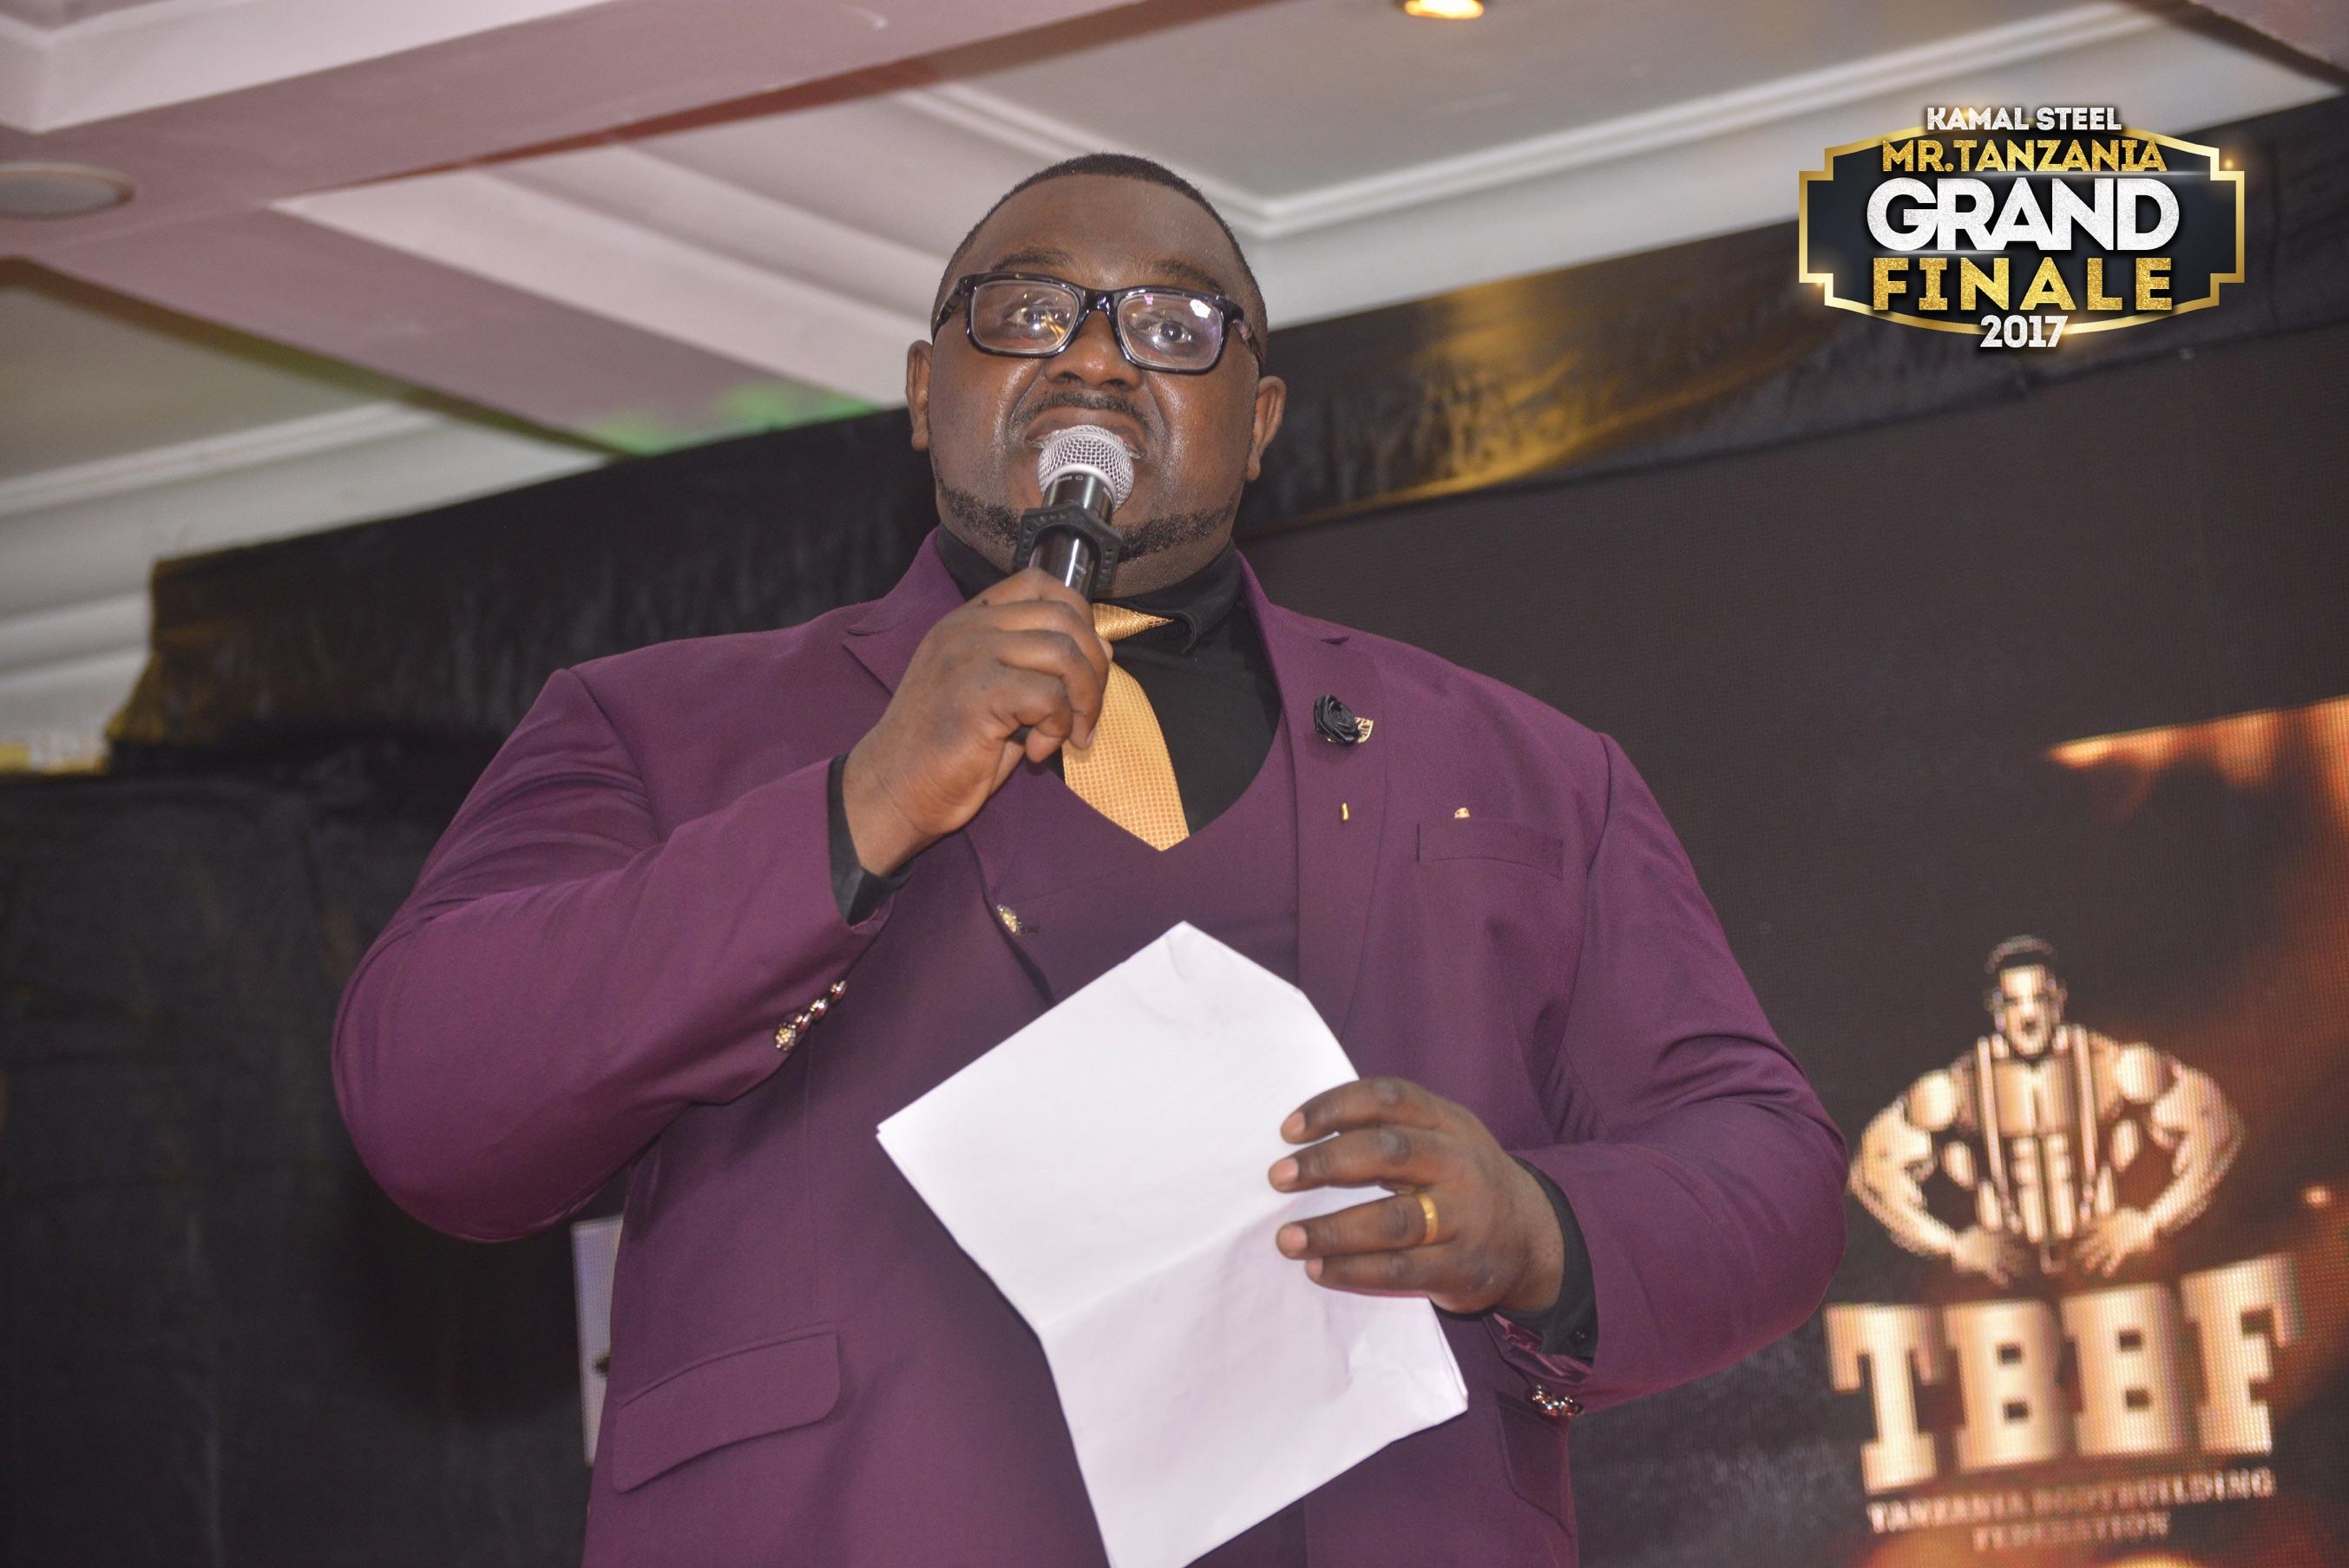 Chris - Mr. Tanzania Host